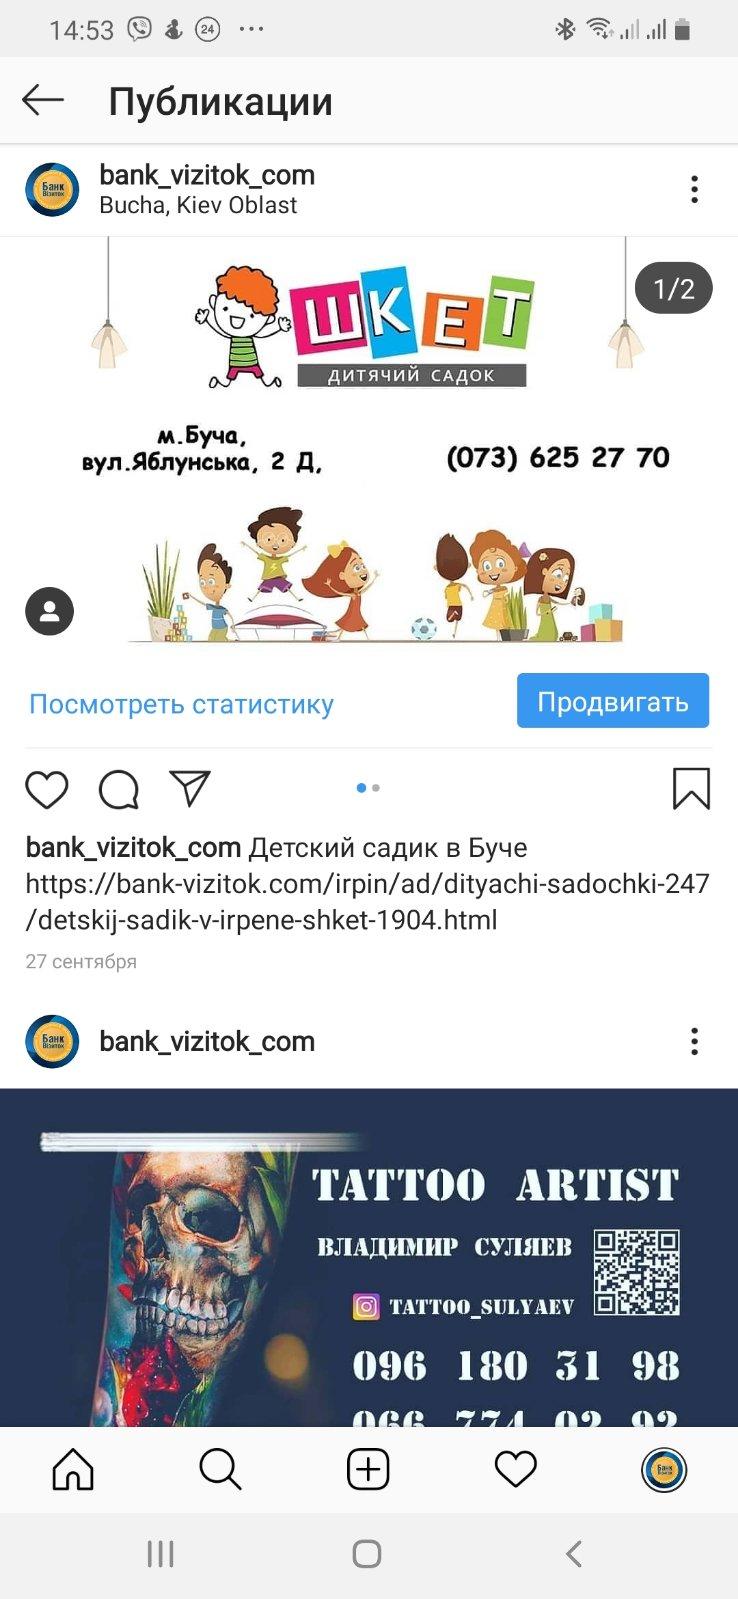 Инстаграм Банк Визиток